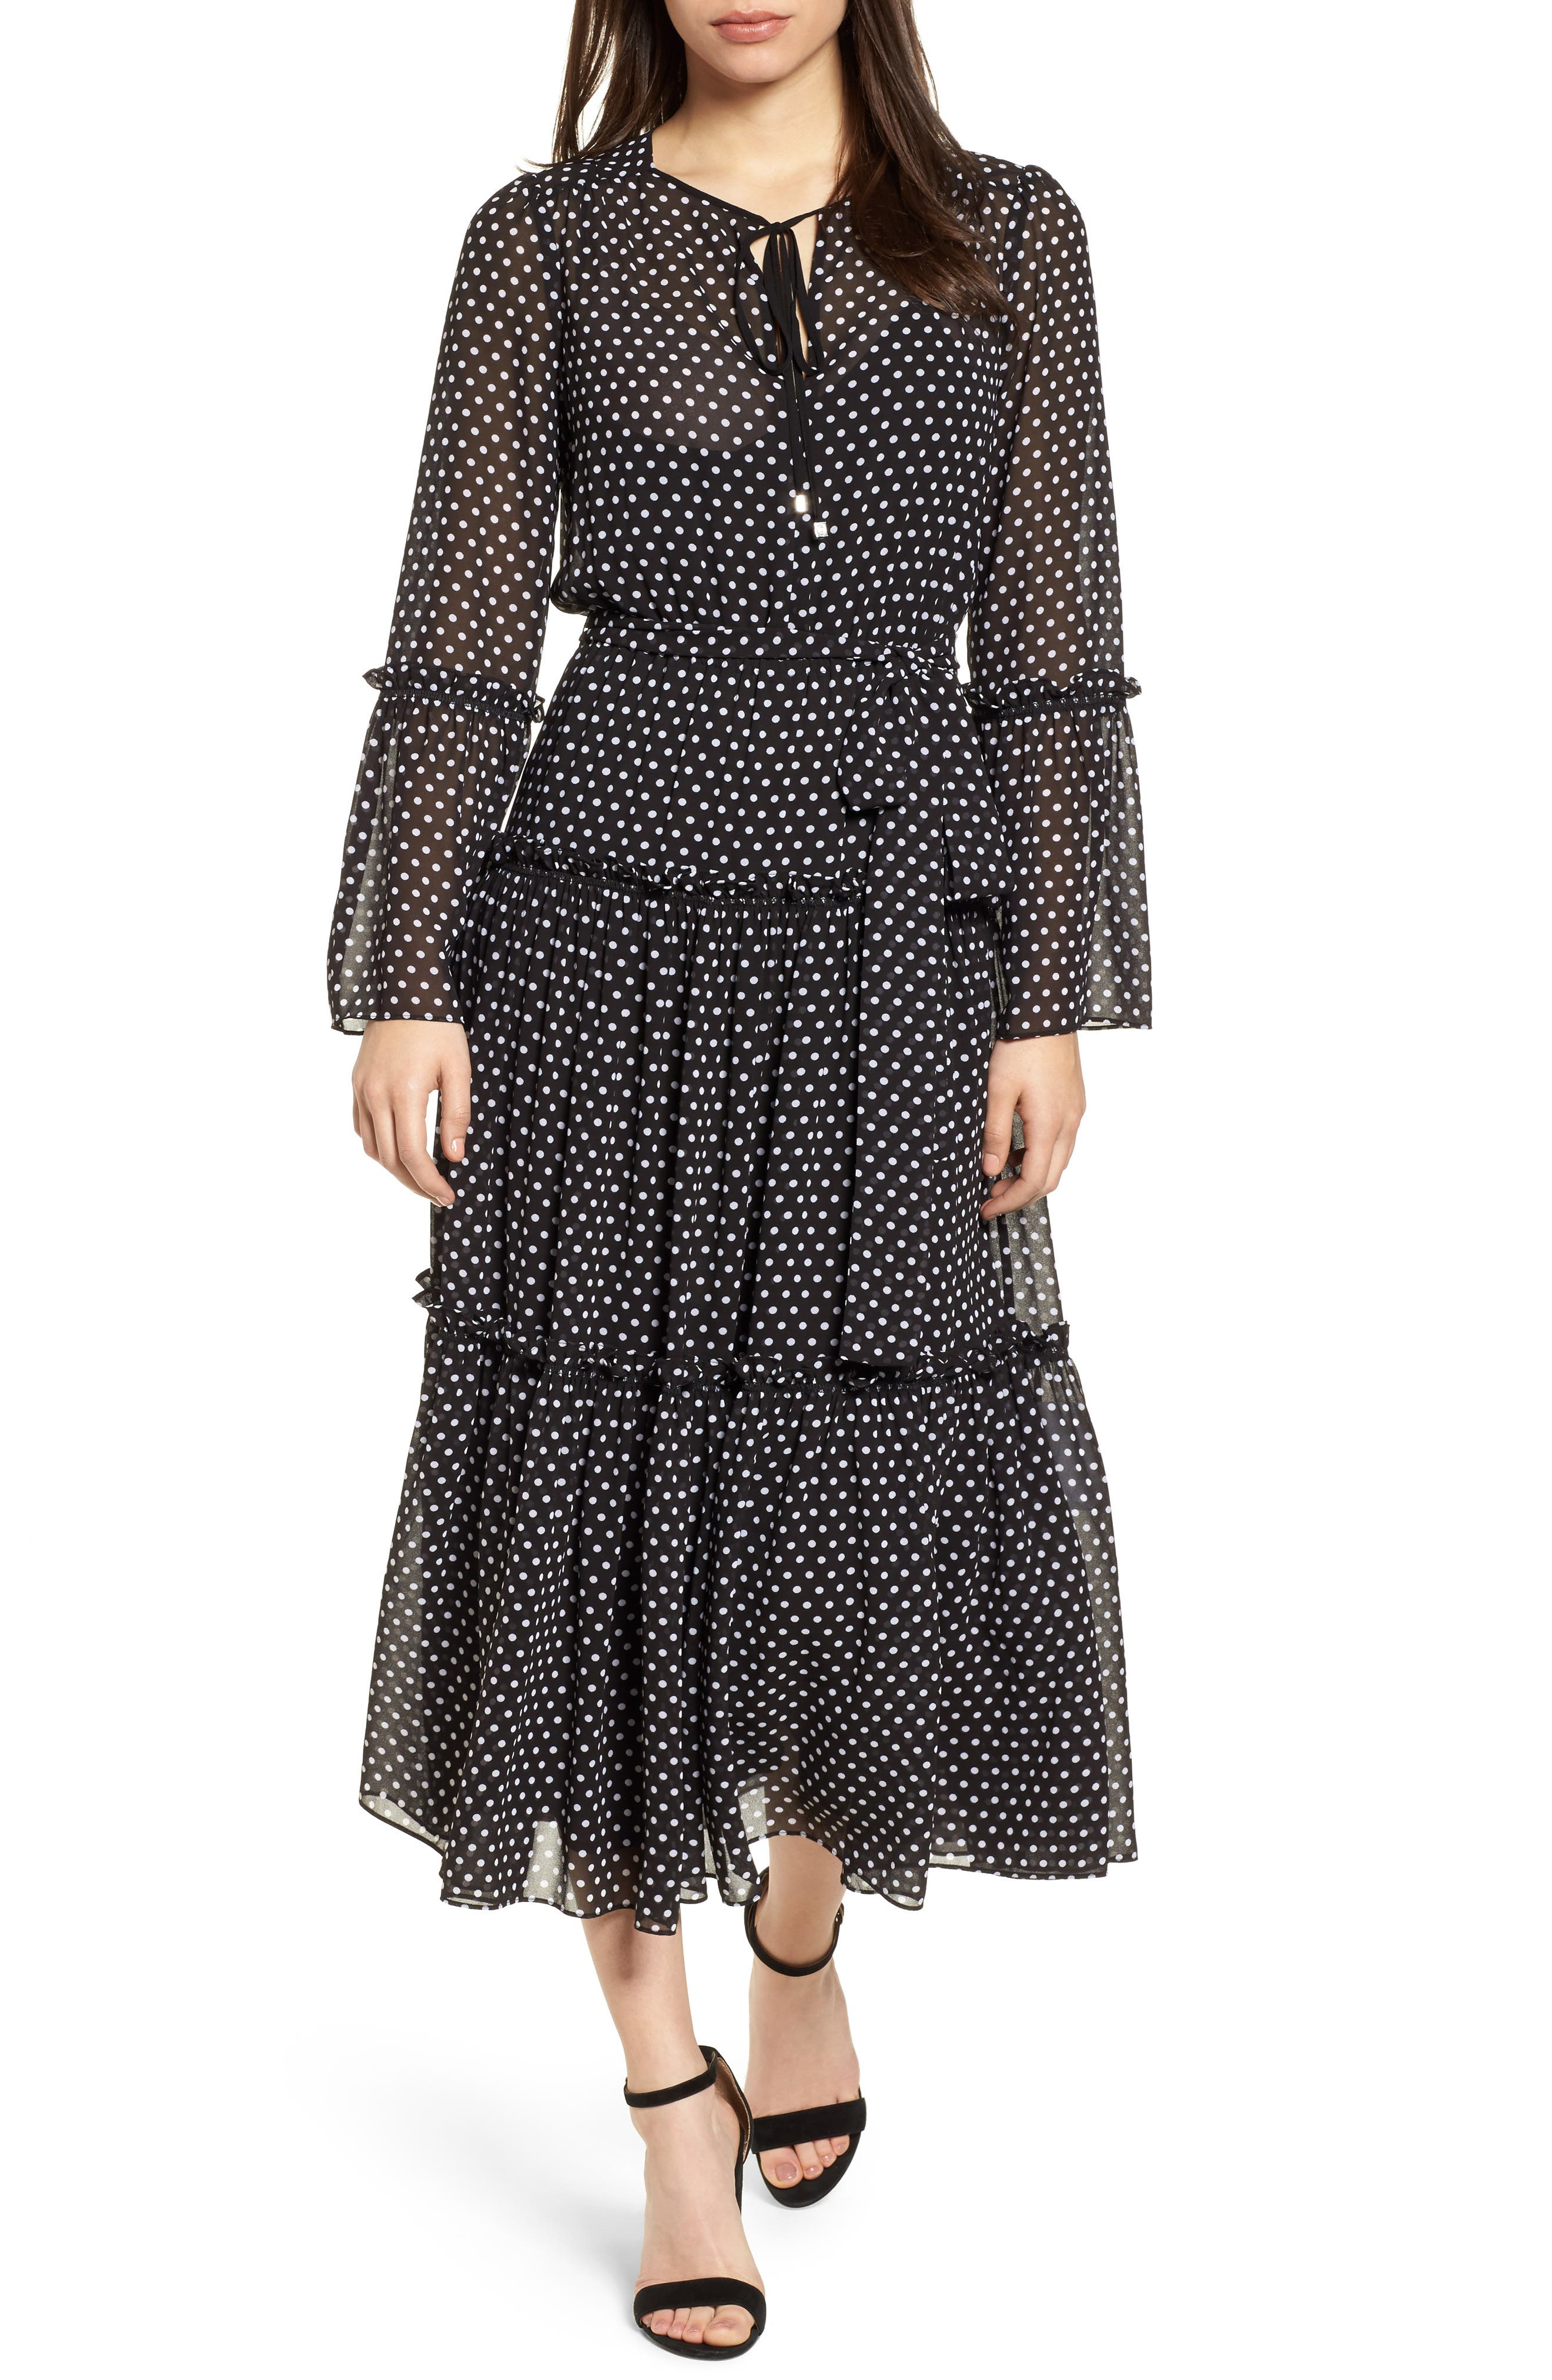 Tiered Dot Boho Dress,                         Main,                         color, Black/ White